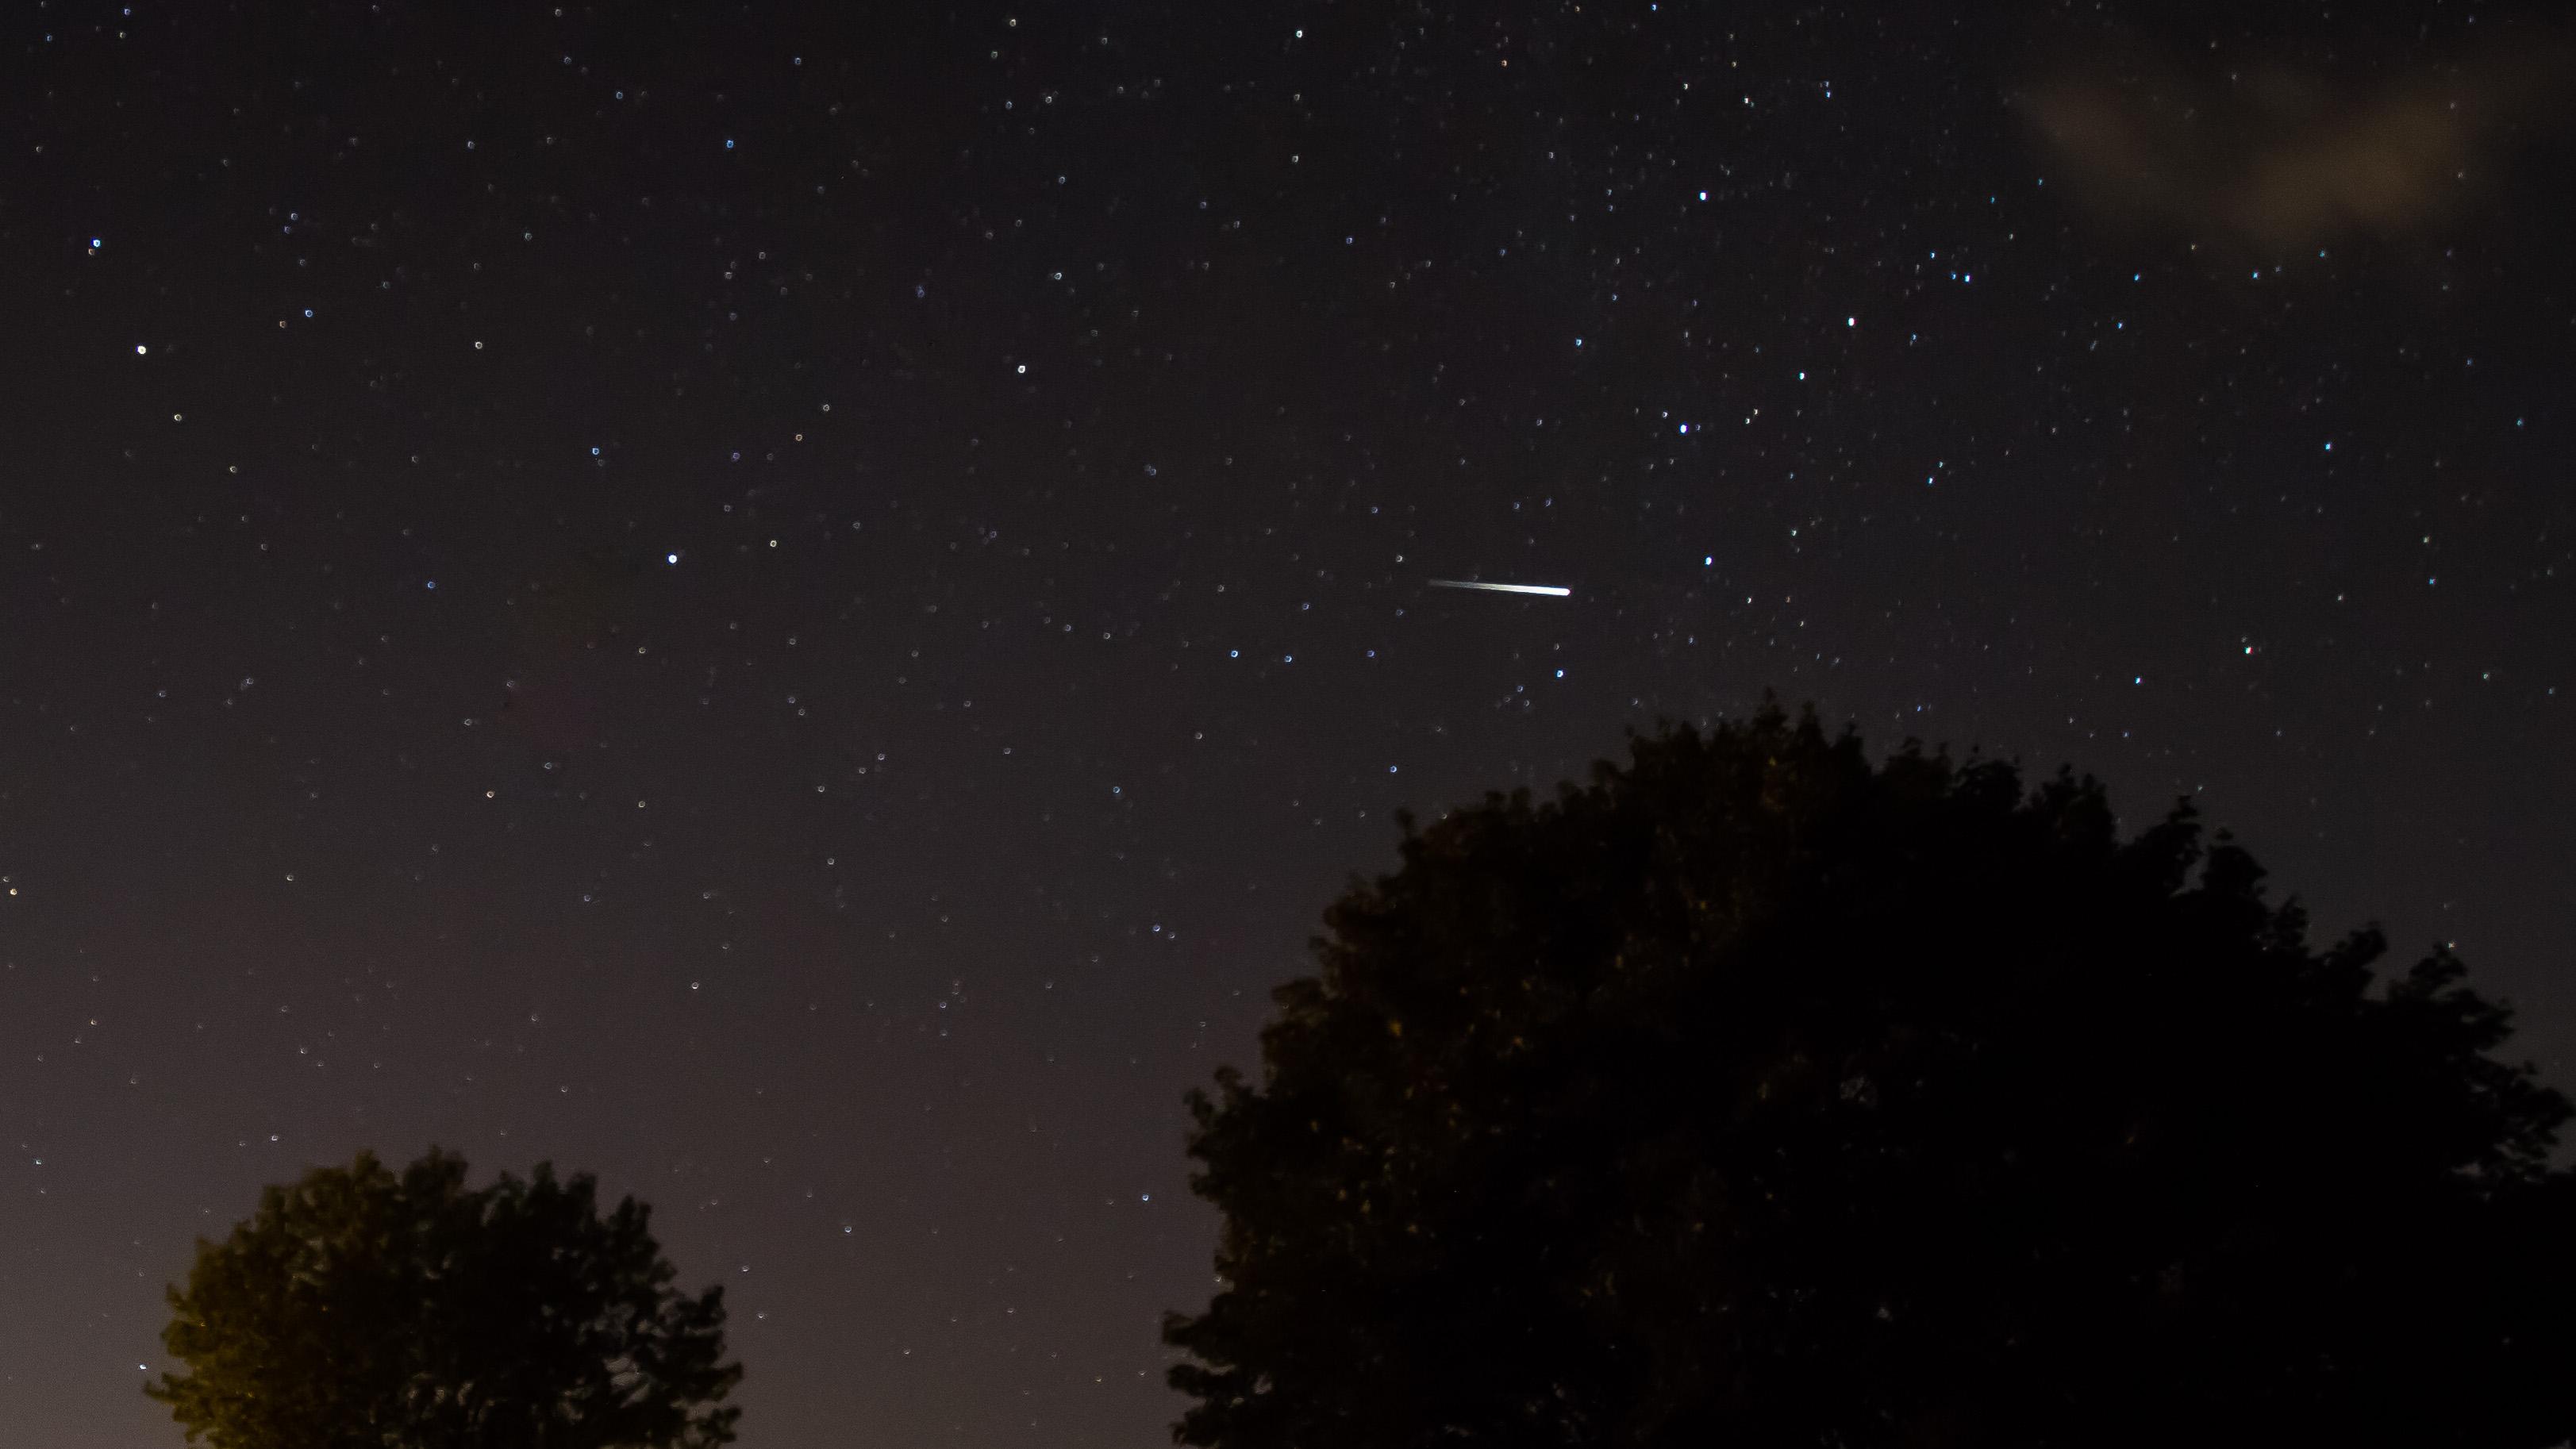 Meteor in night sky